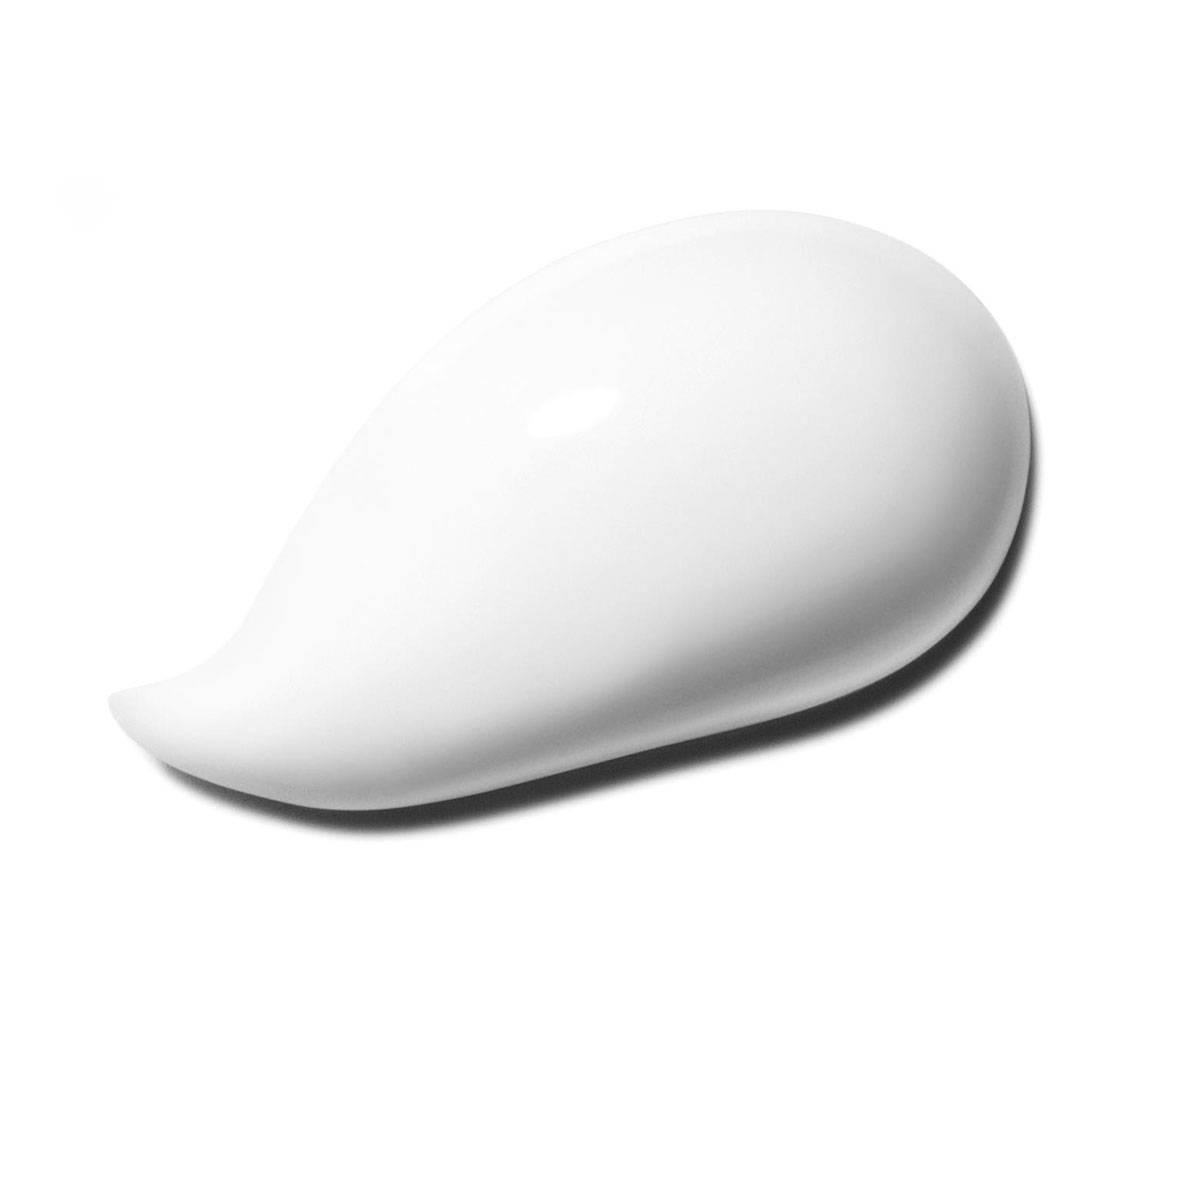 La Roche Posay ProductPage Hydreane Rich Texture